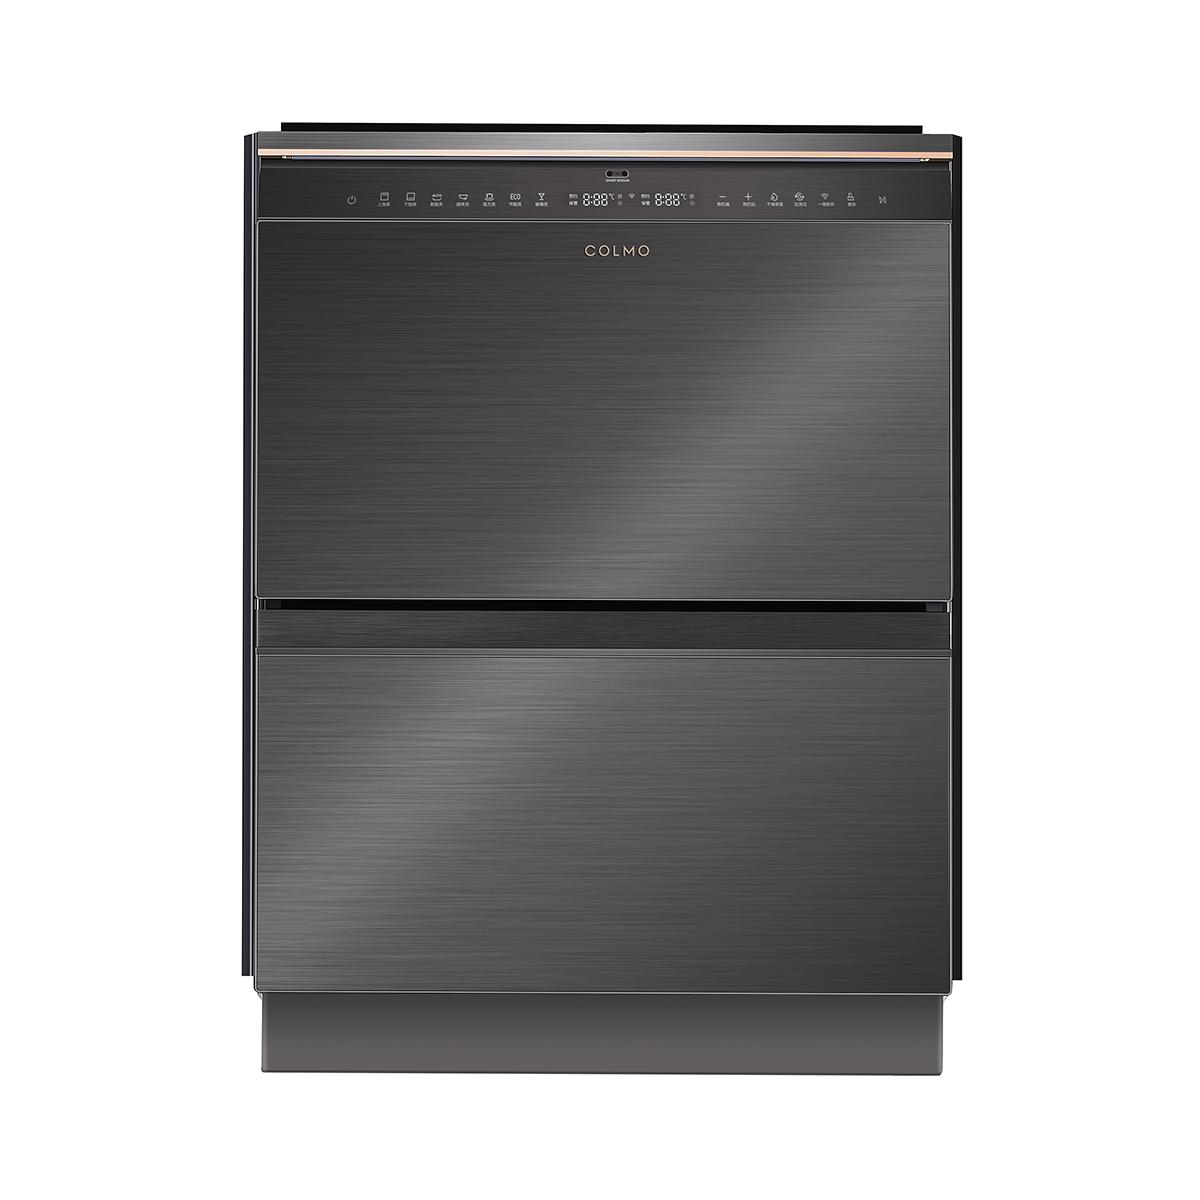 COLMO CDDTW612洗碗机 说明书.pdf